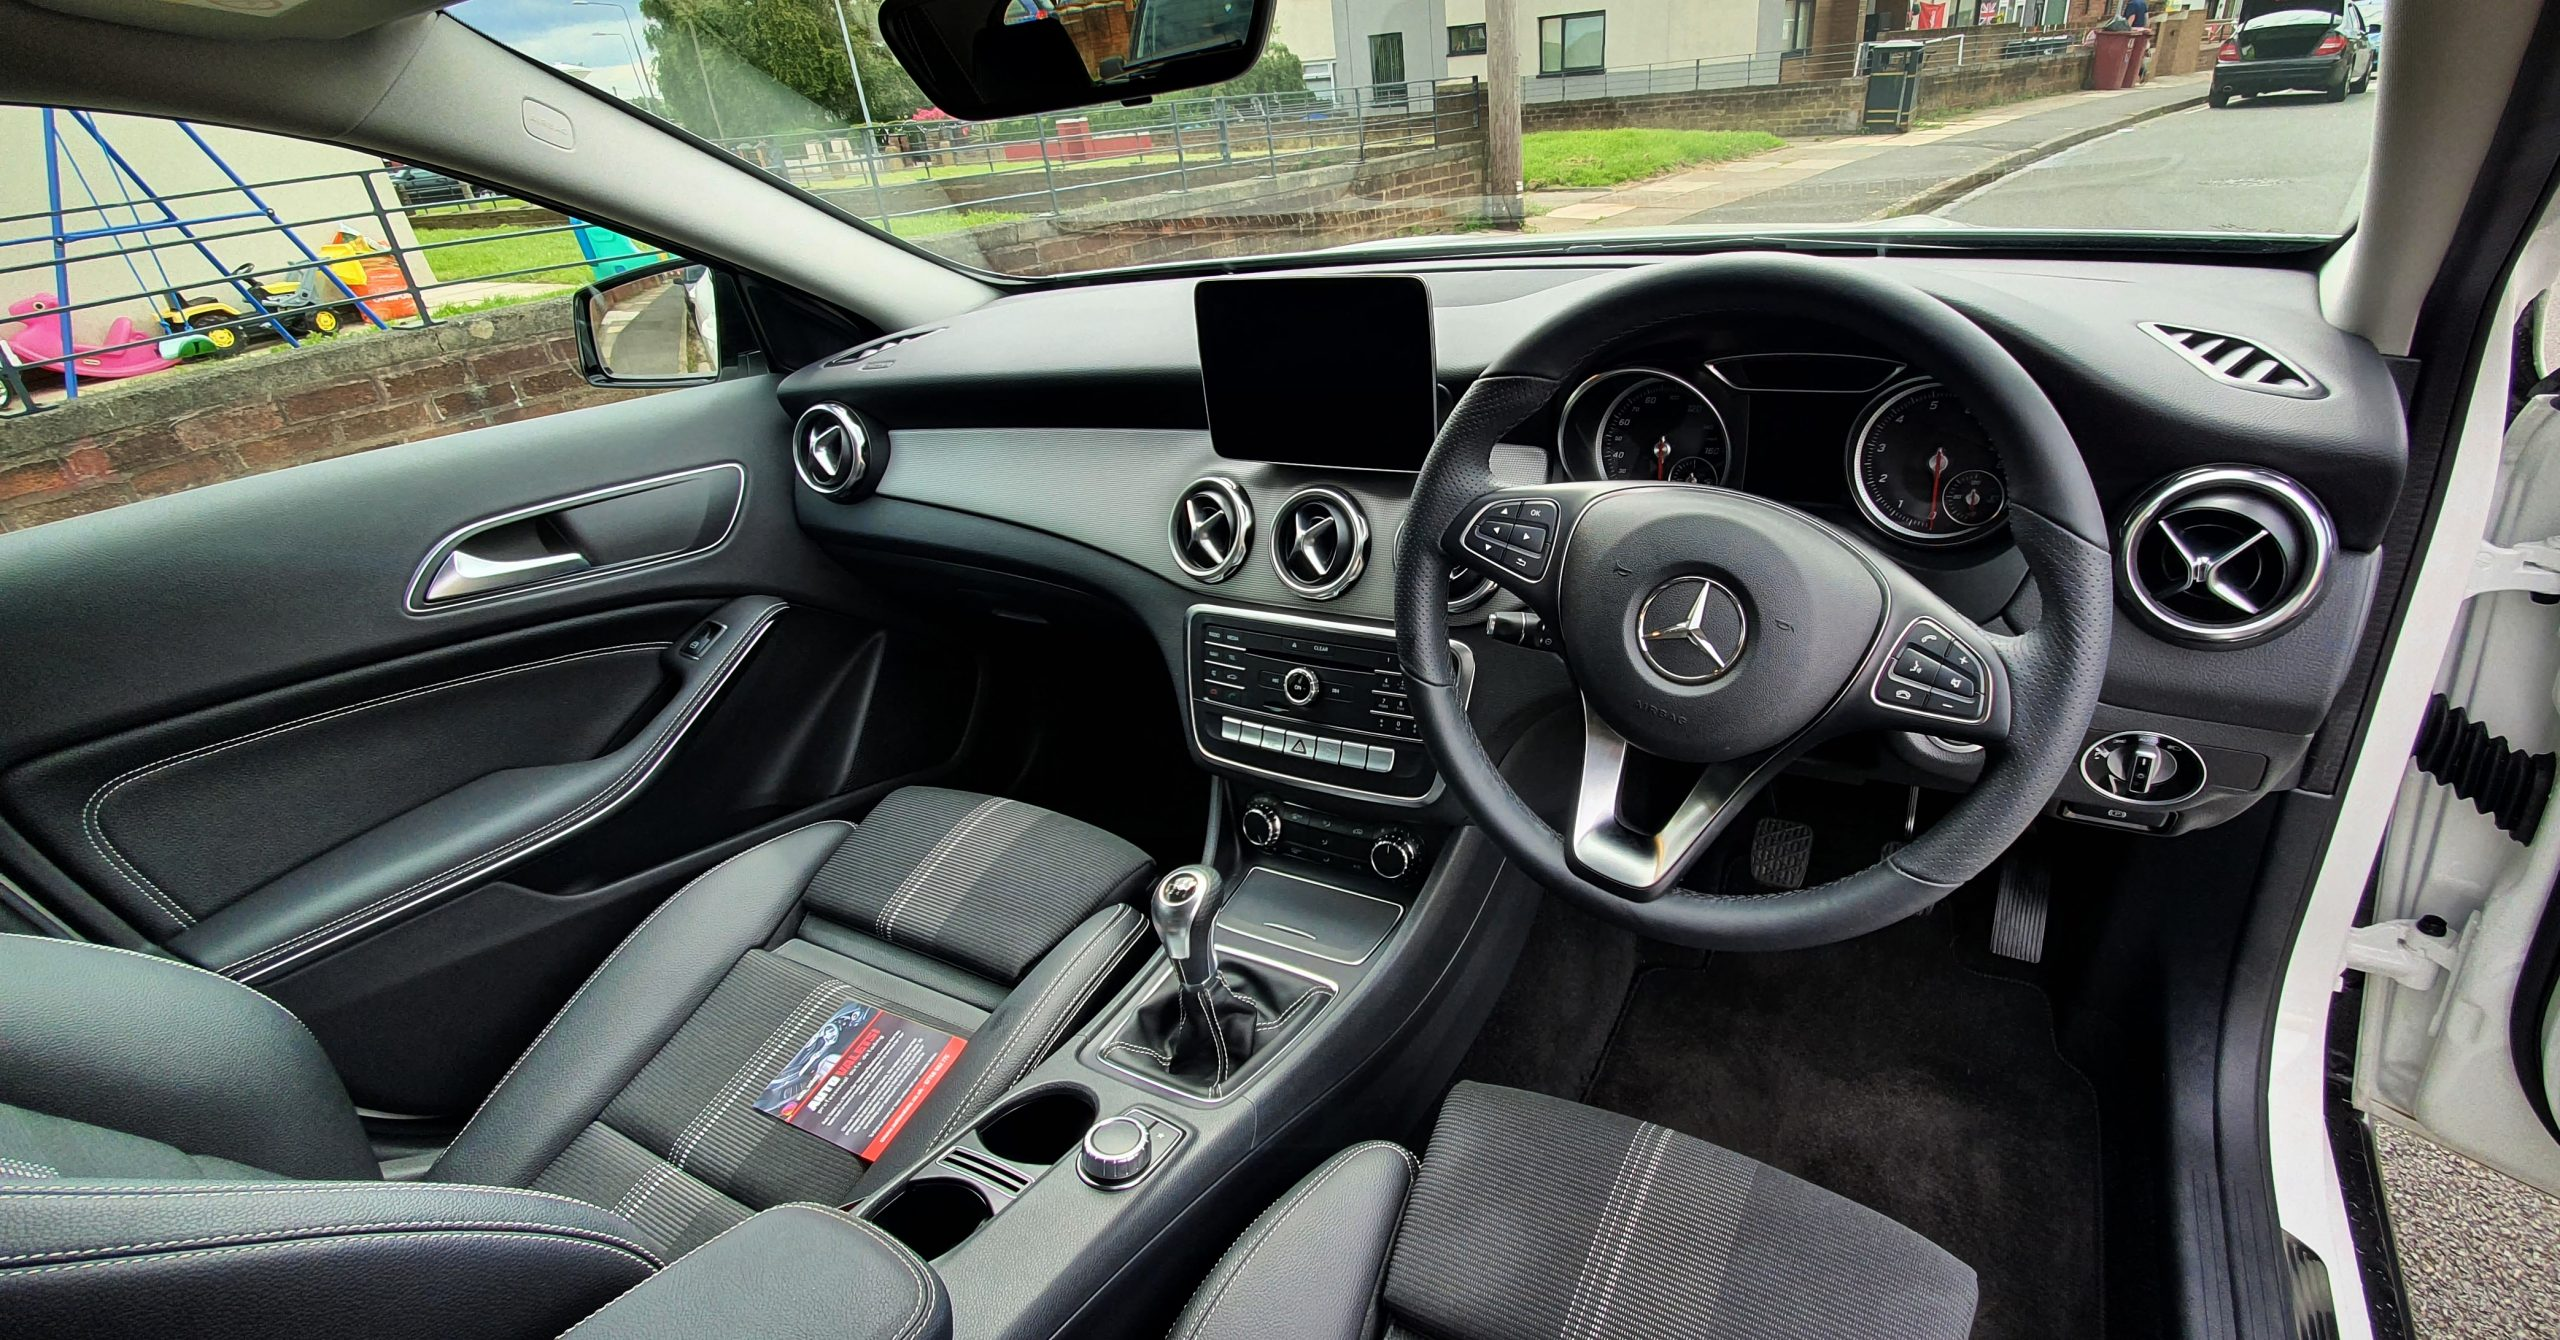 Clean Mercedes Interior